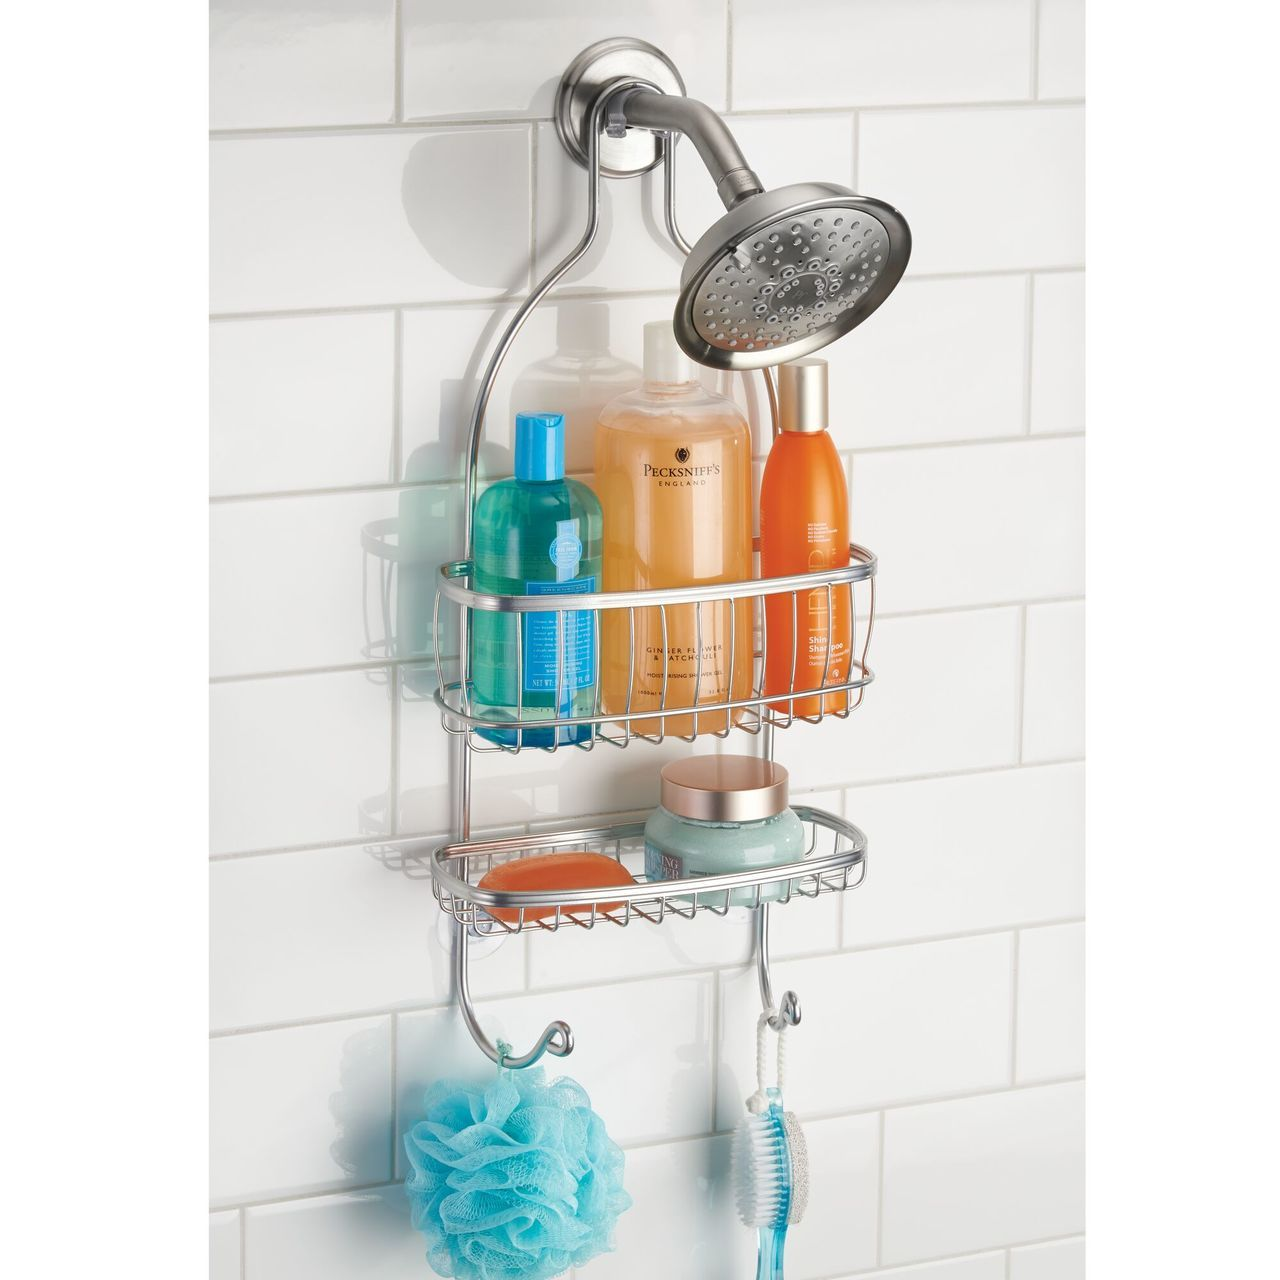 Metal Hanging Bathroom Tub/Shower Storage Caddy in Graphite, by mDesign